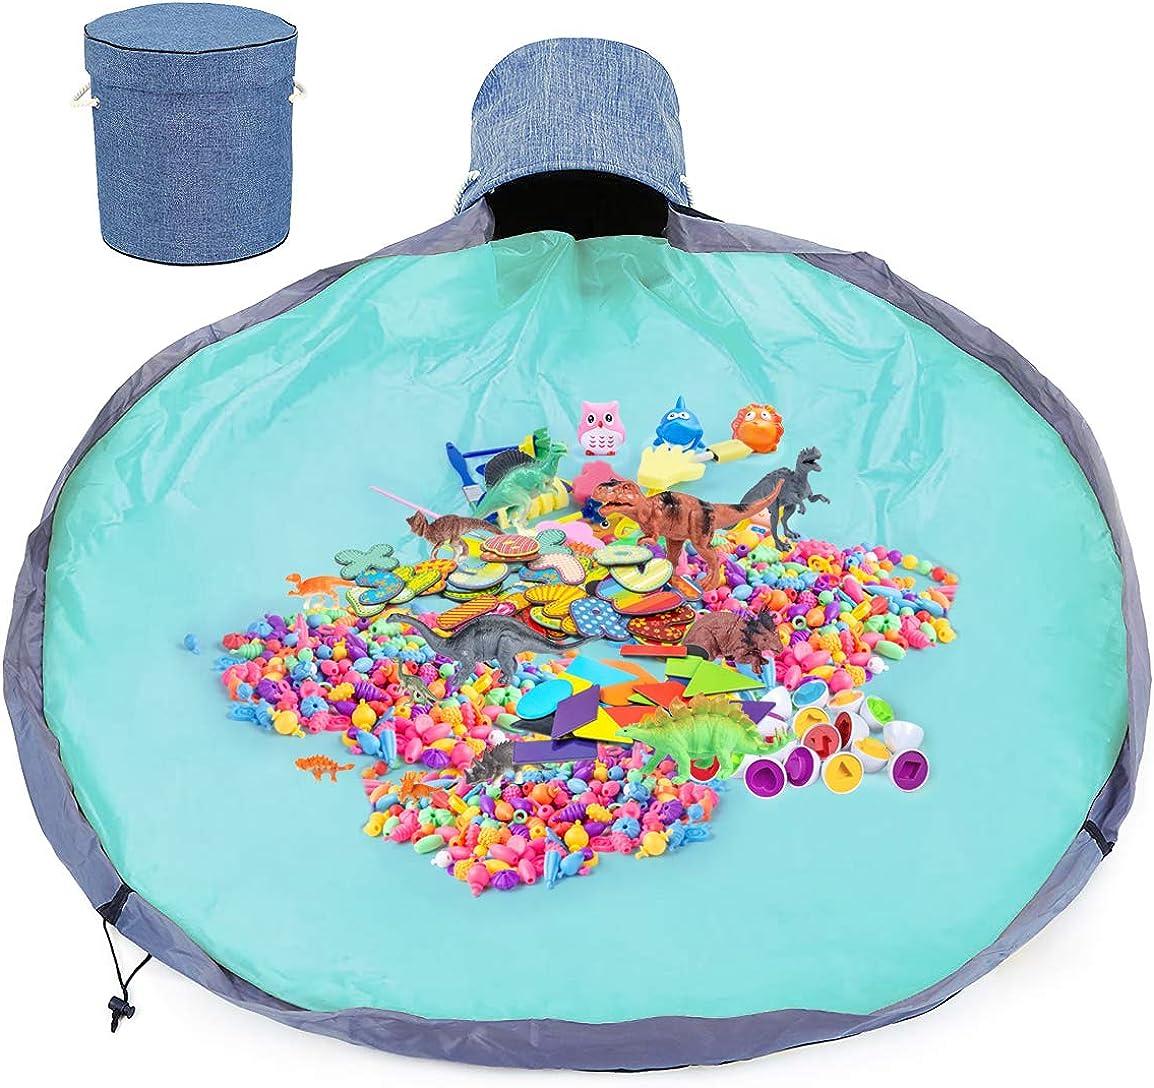 Refasy Play Mat and Toy Storage Organizer Baskets Storage Bins Toy Organizer for Kids Room